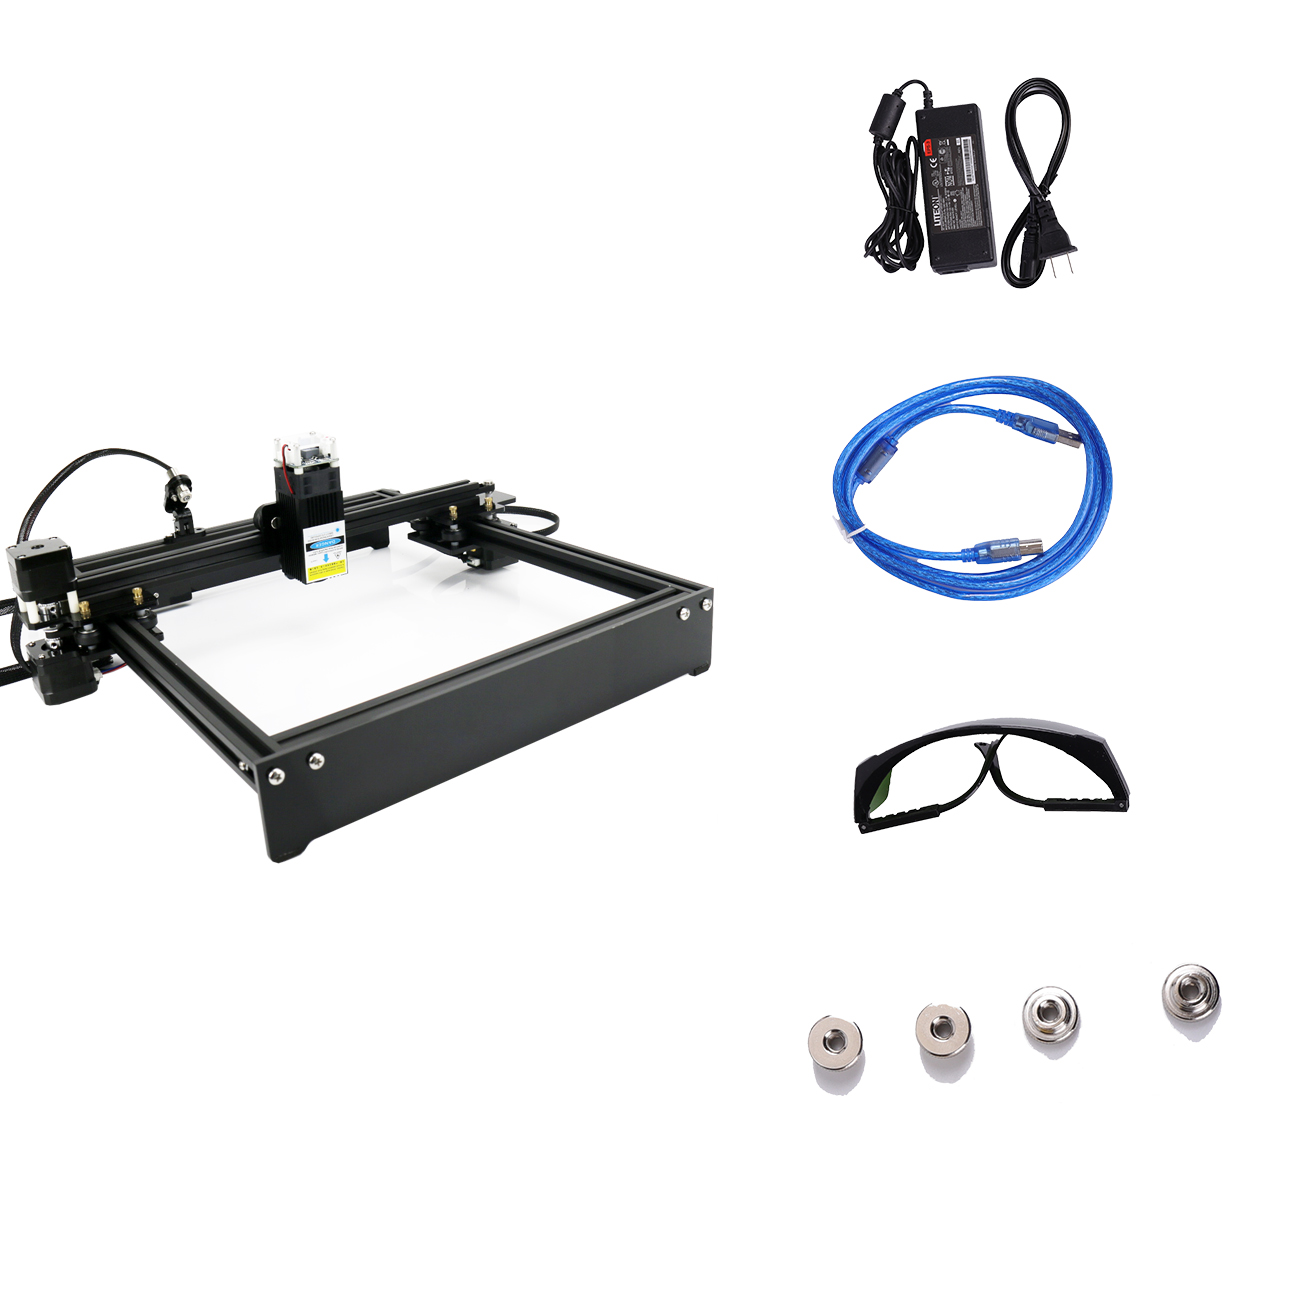 High Power 30W 40W Laser Cutting Machine Desktop Laser Engraver Laser Printer - Laser CNC Router Wooden Craft Carving